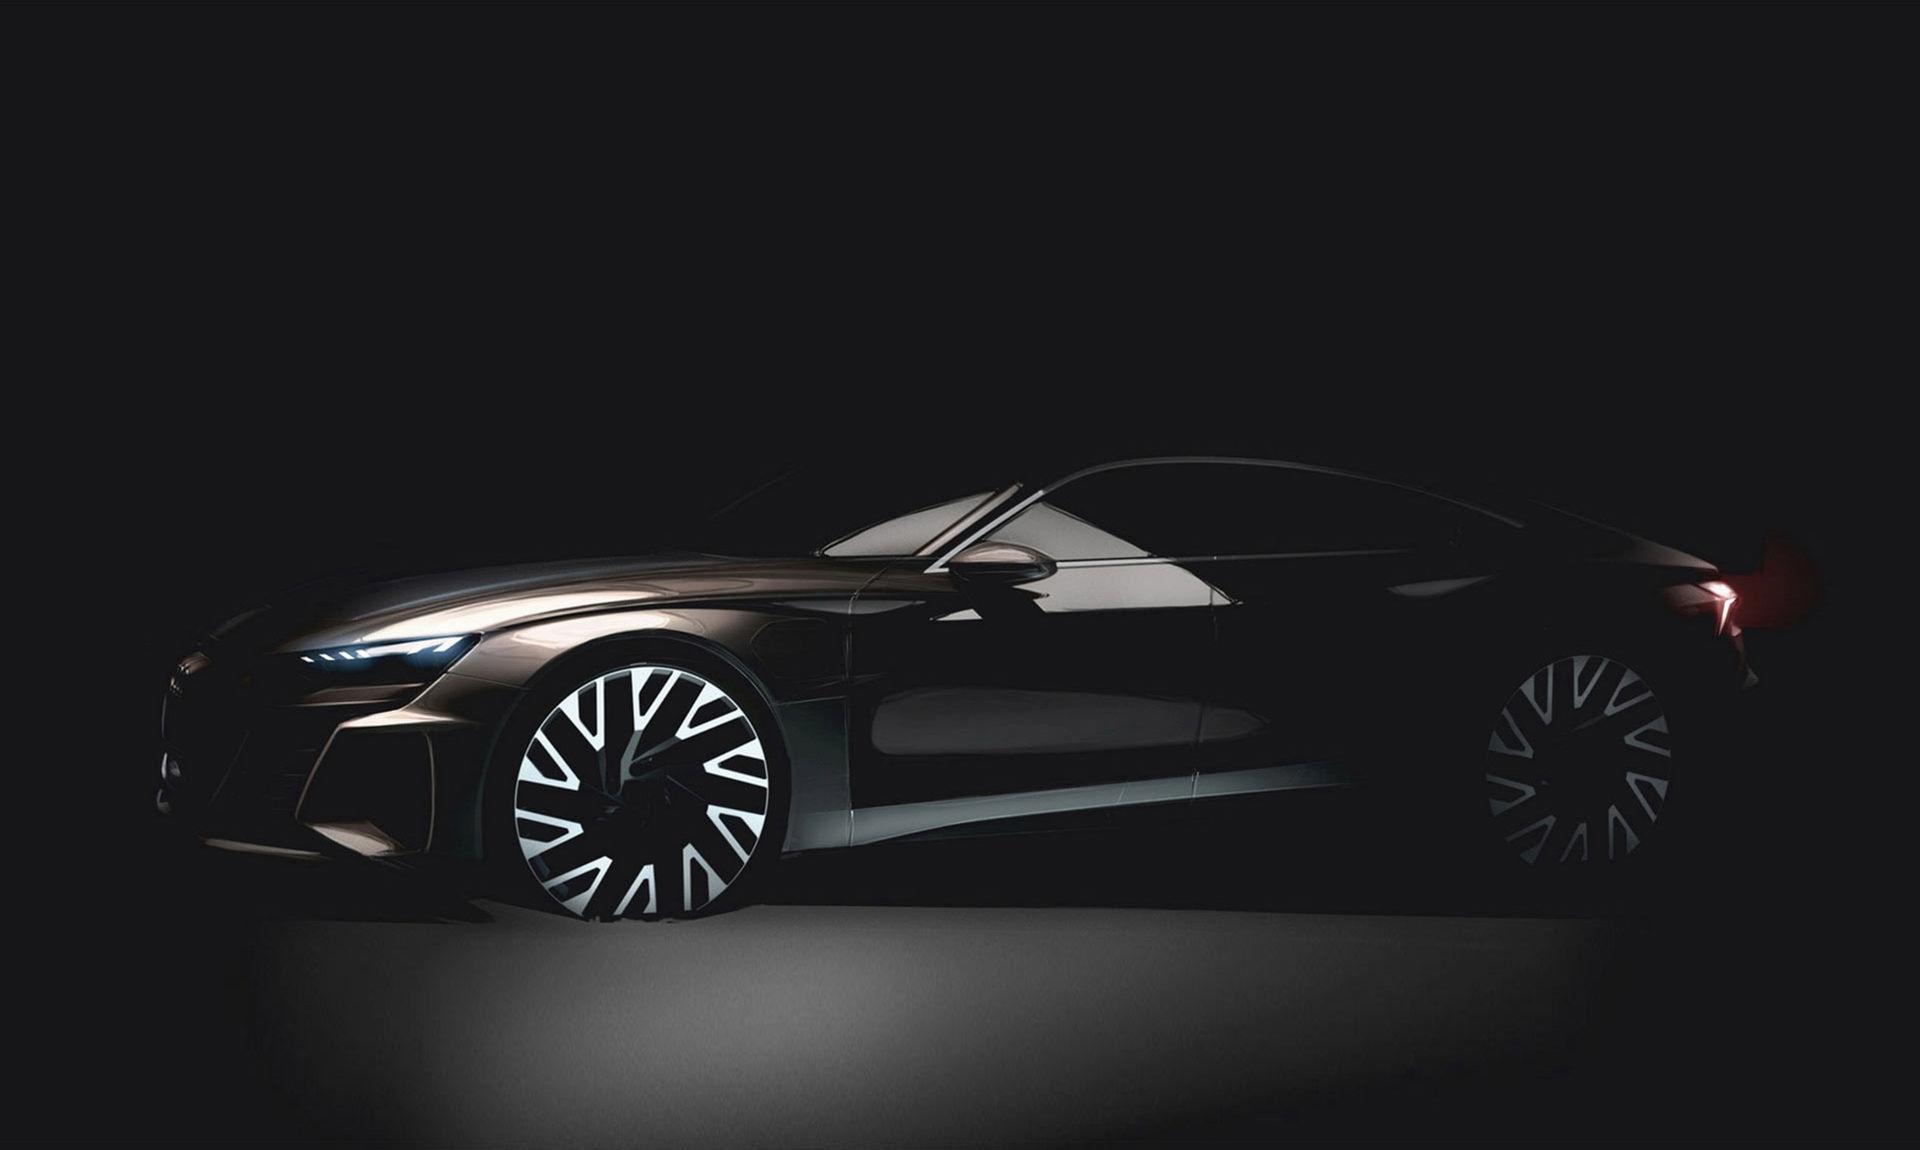 Audis kommande e-tron GT kan ladda 80 procent på 12 minuter